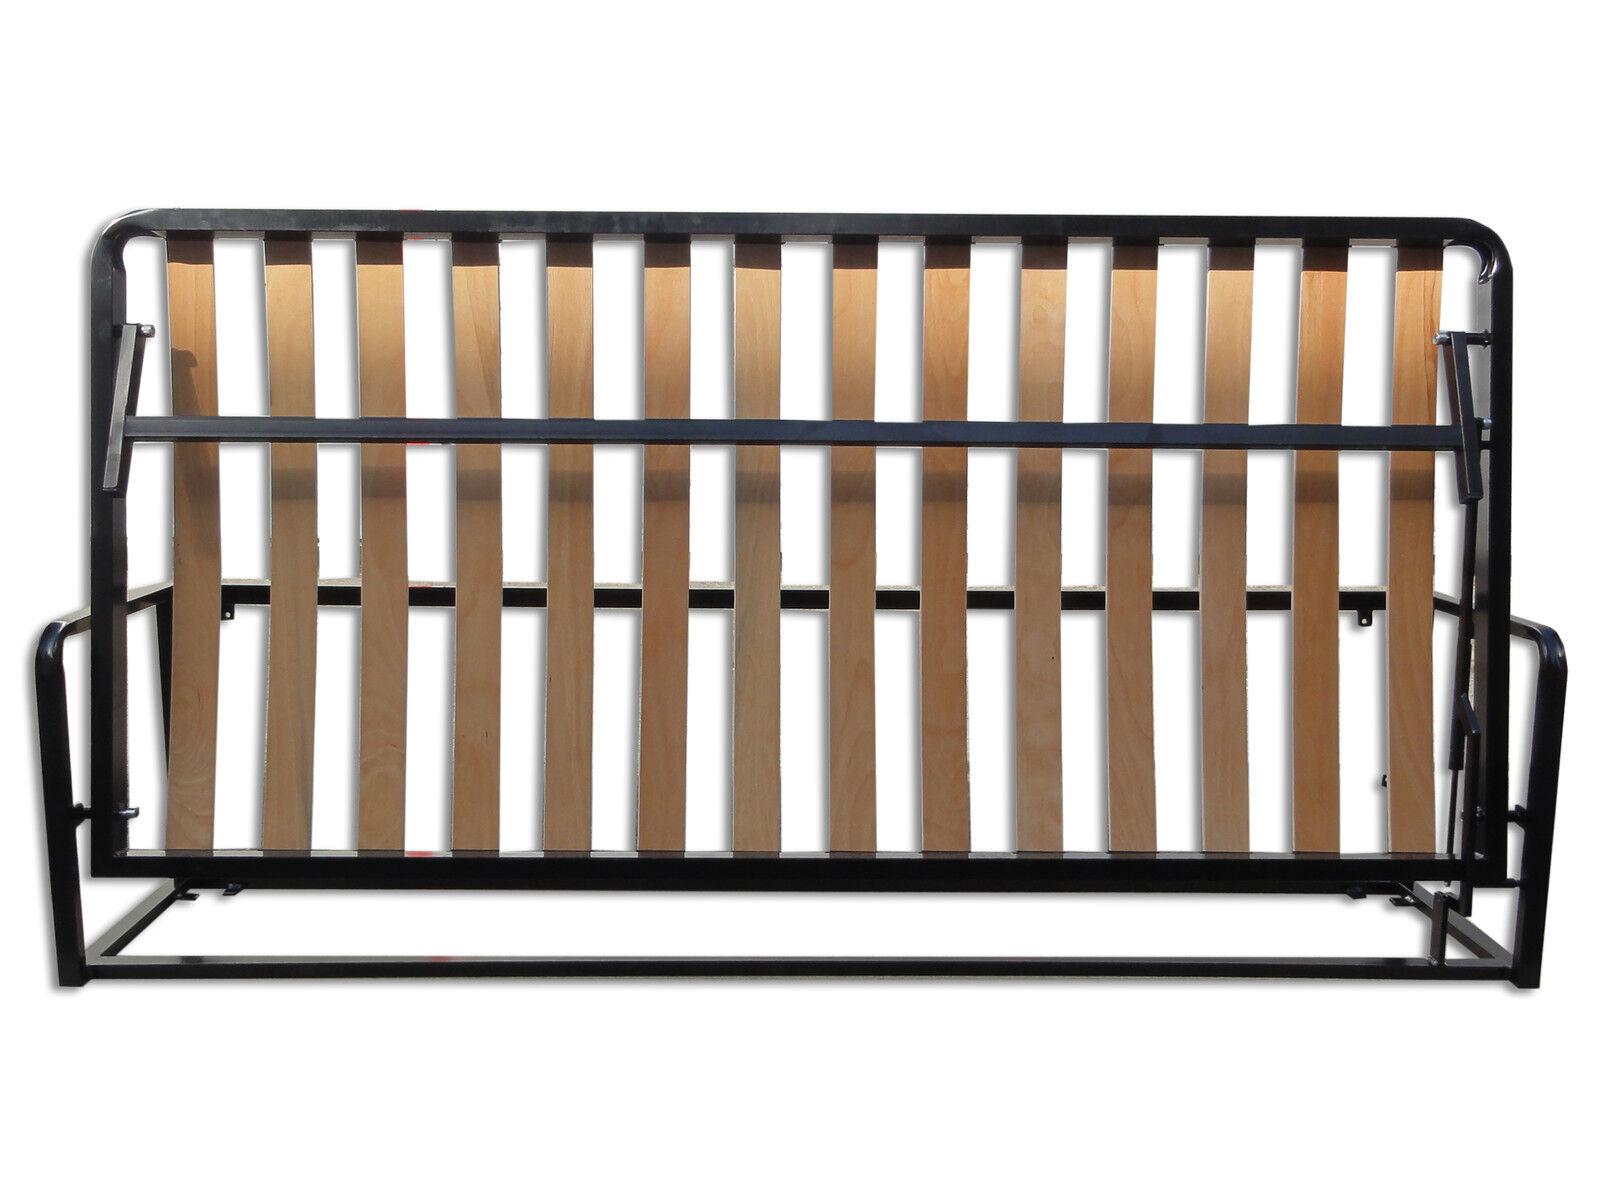 somier cama abatible horizontal cama empotrable horizontal cama plegable 90x200 ebay. Black Bedroom Furniture Sets. Home Design Ideas